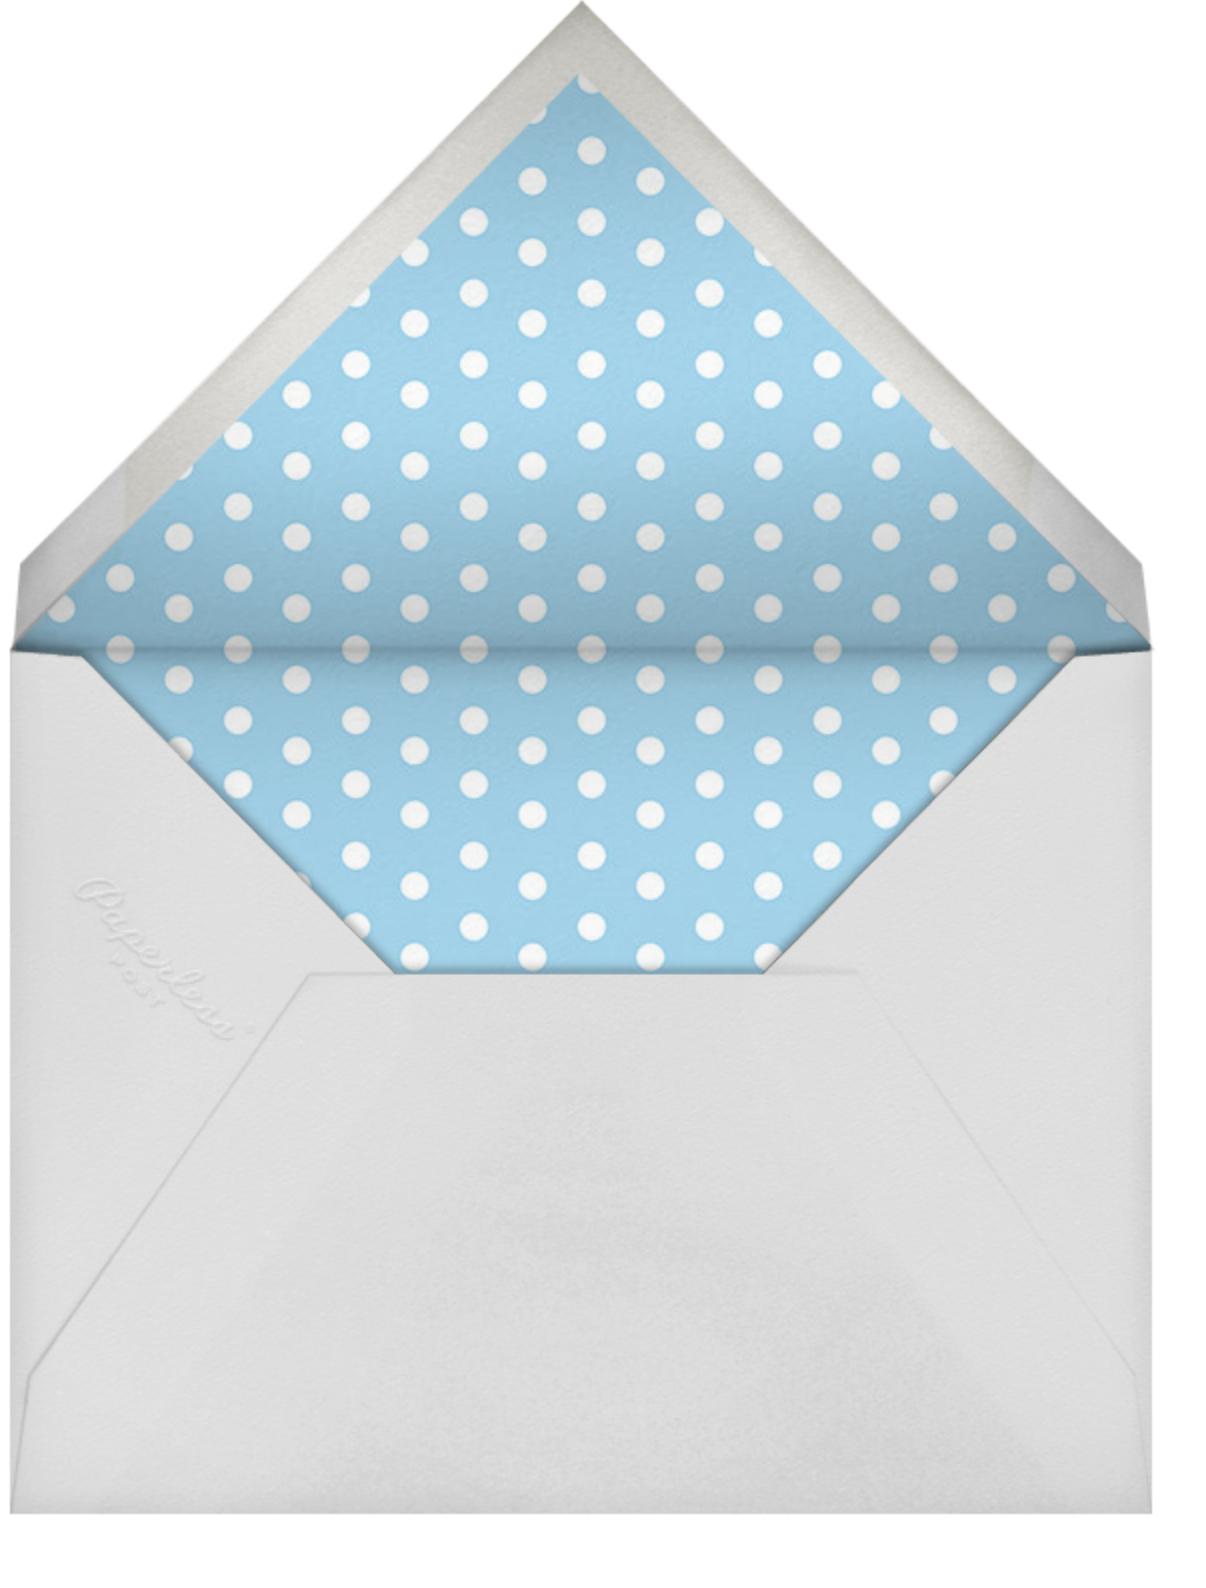 Biplane - Light Blue - Paperless Post - Farewell party - envelope back